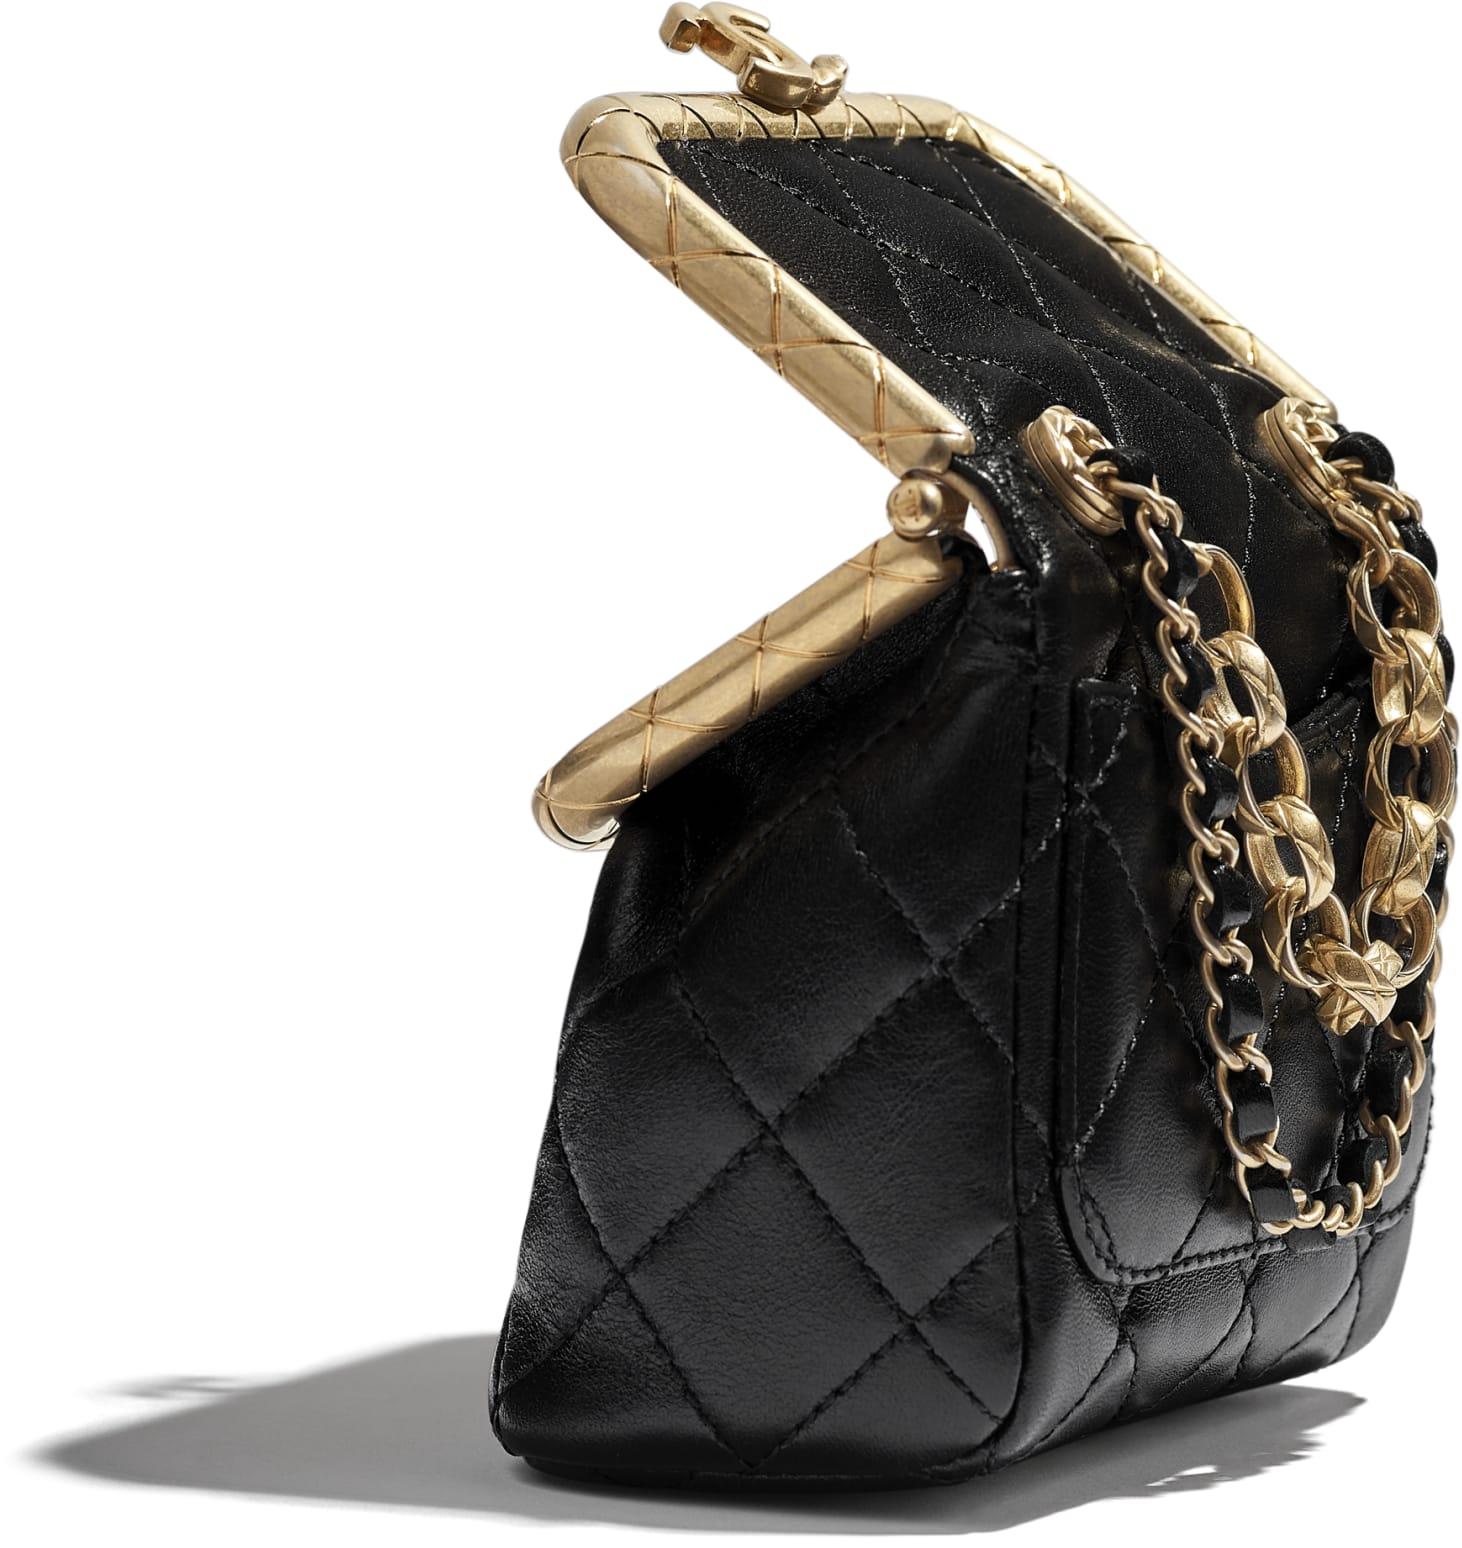 Small Kiss-Lock Bag